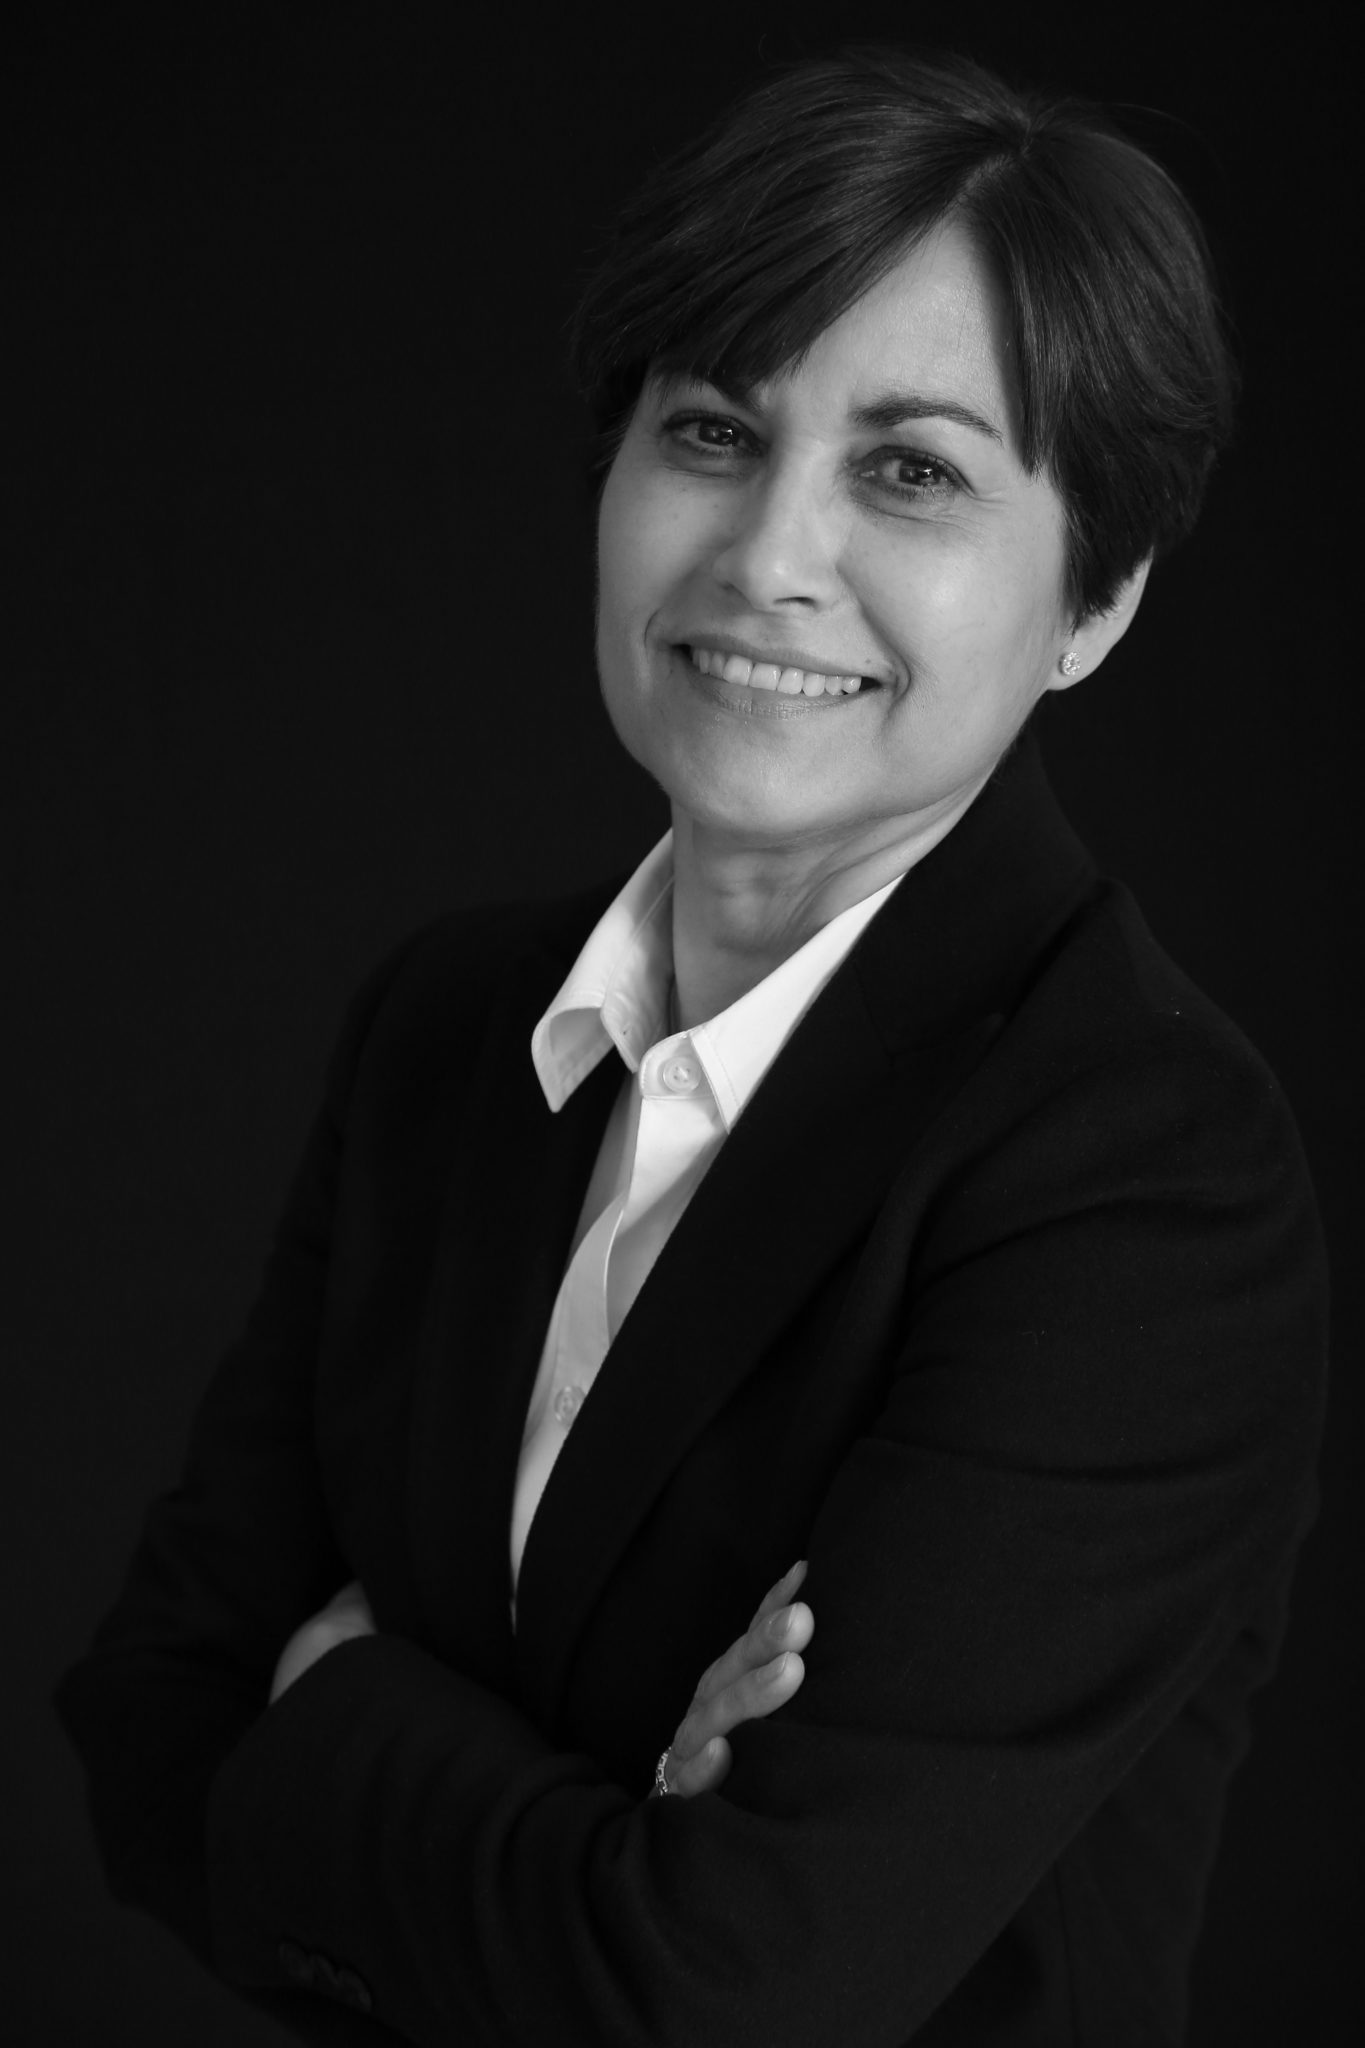 Fatima Rodrigues